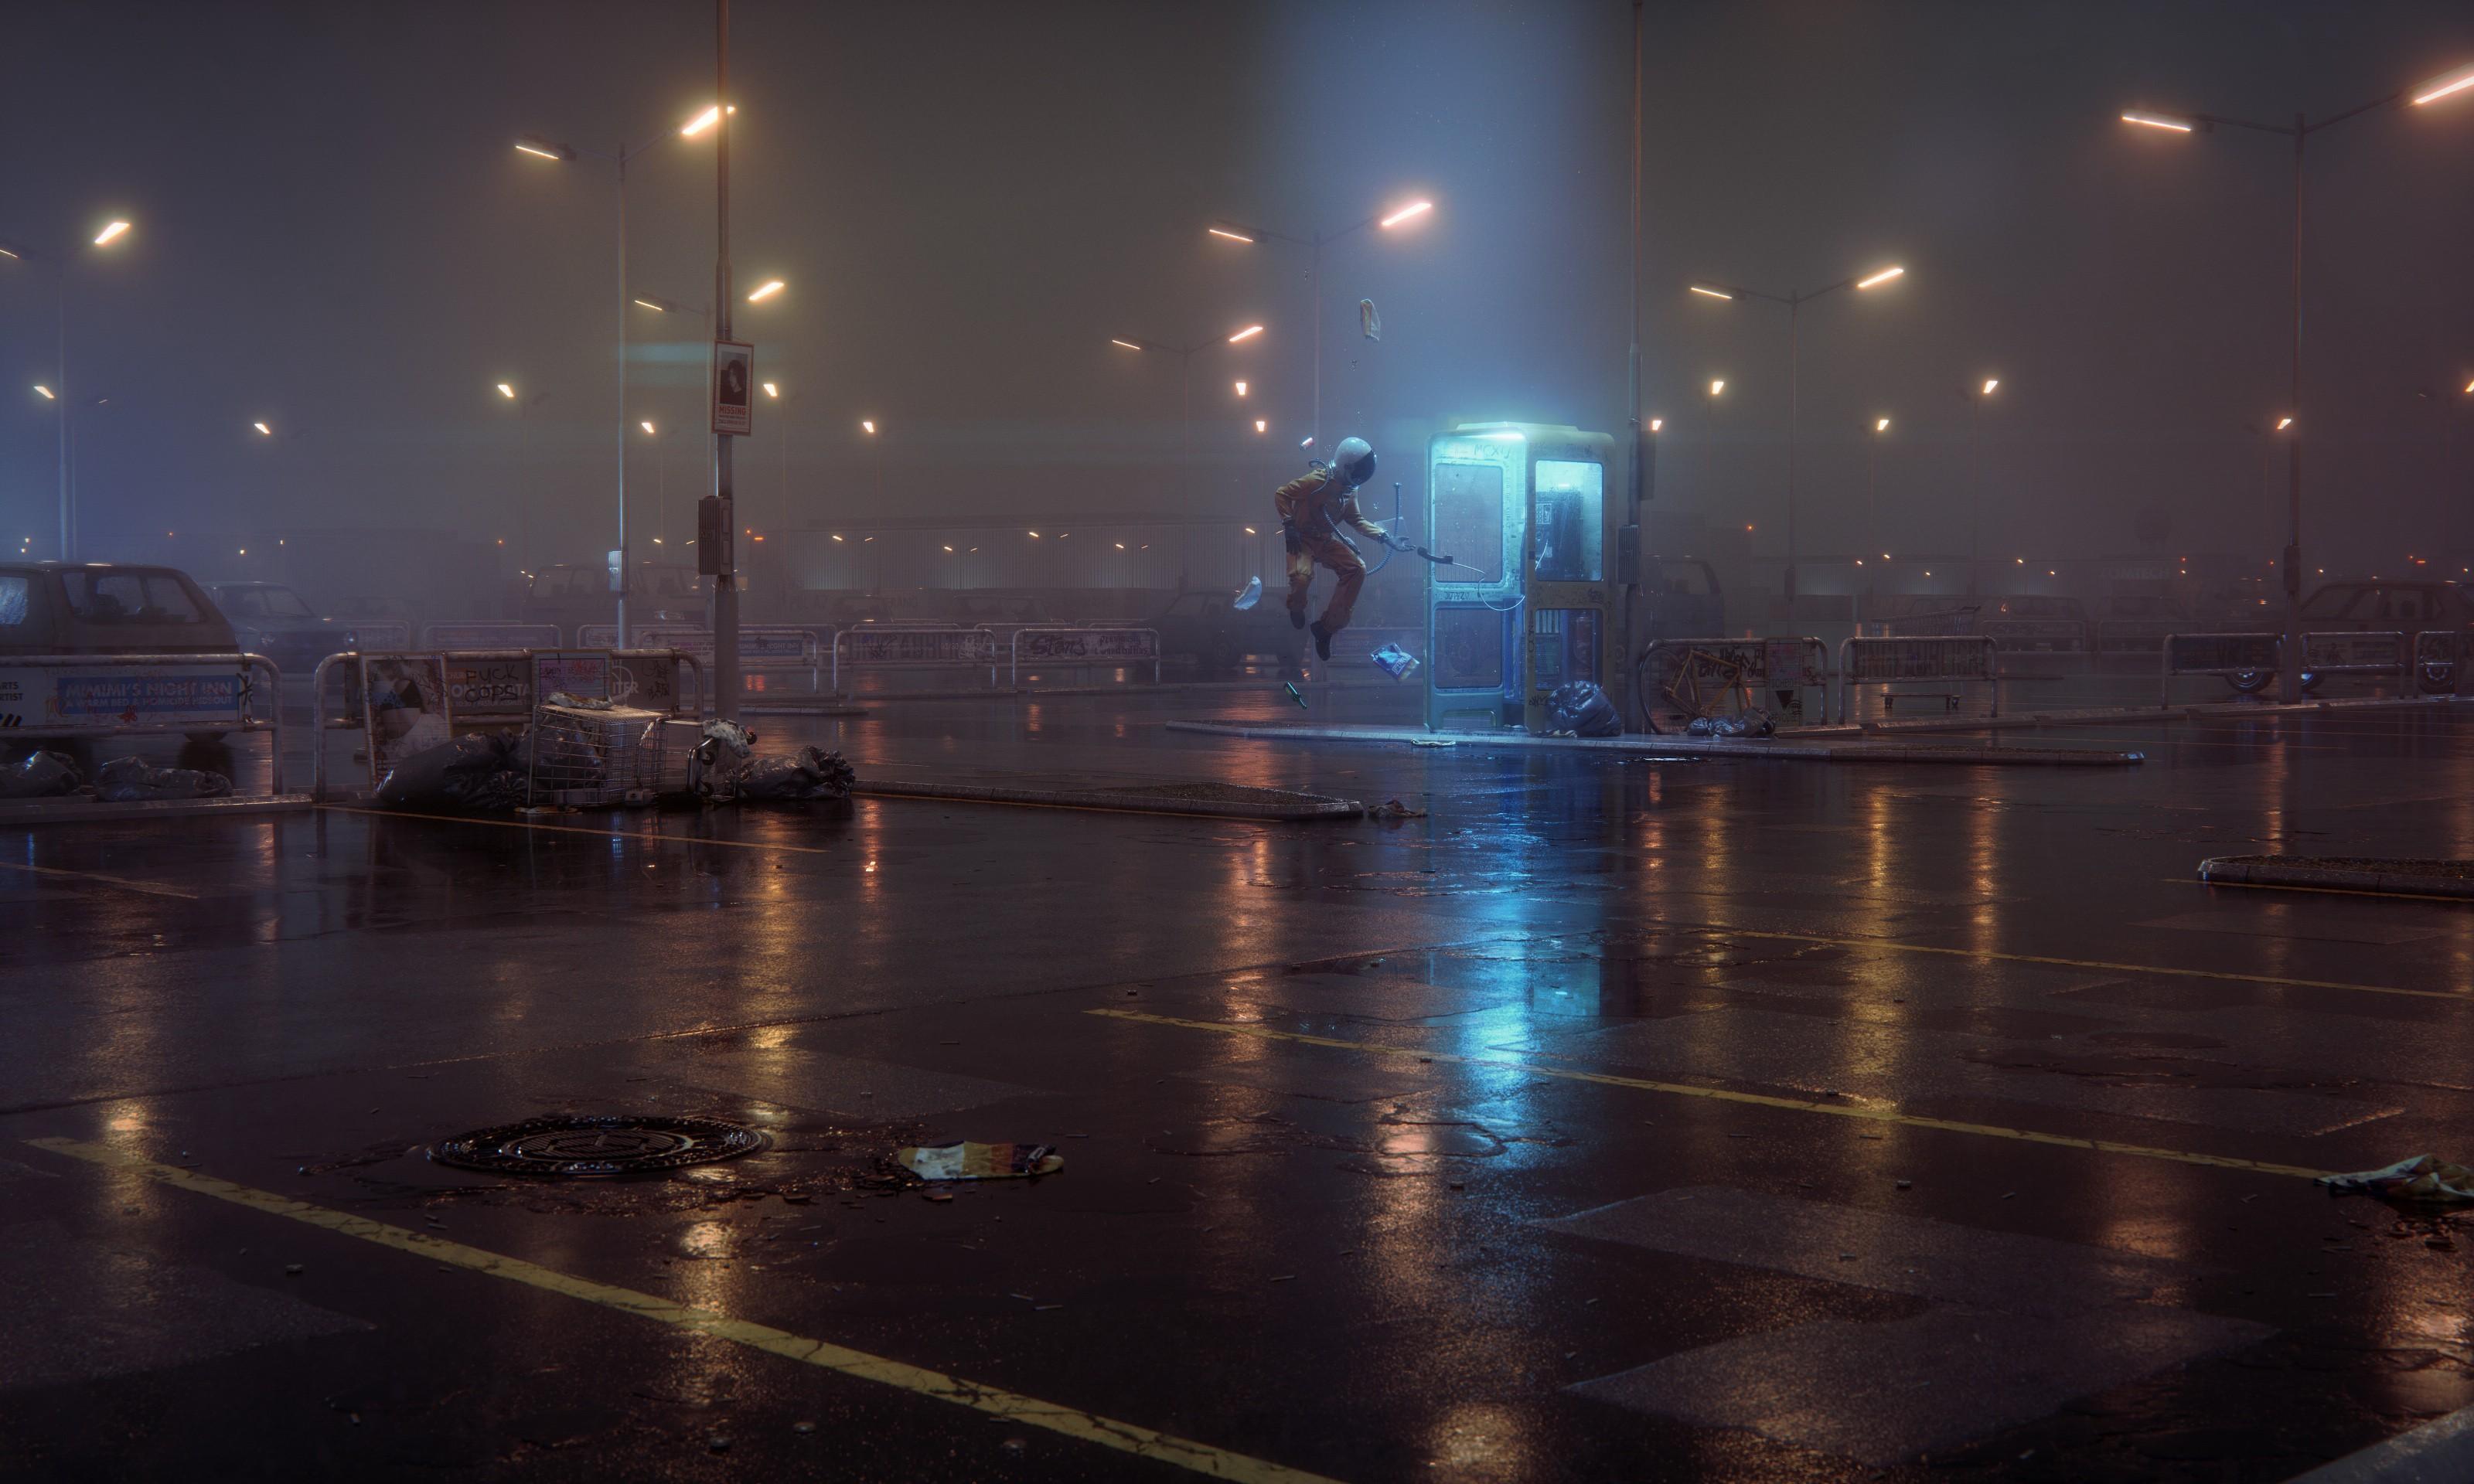 General 3200x1920 digital art night parking lot lights dark blue light phone box wet street trash mist floating street light astronaut